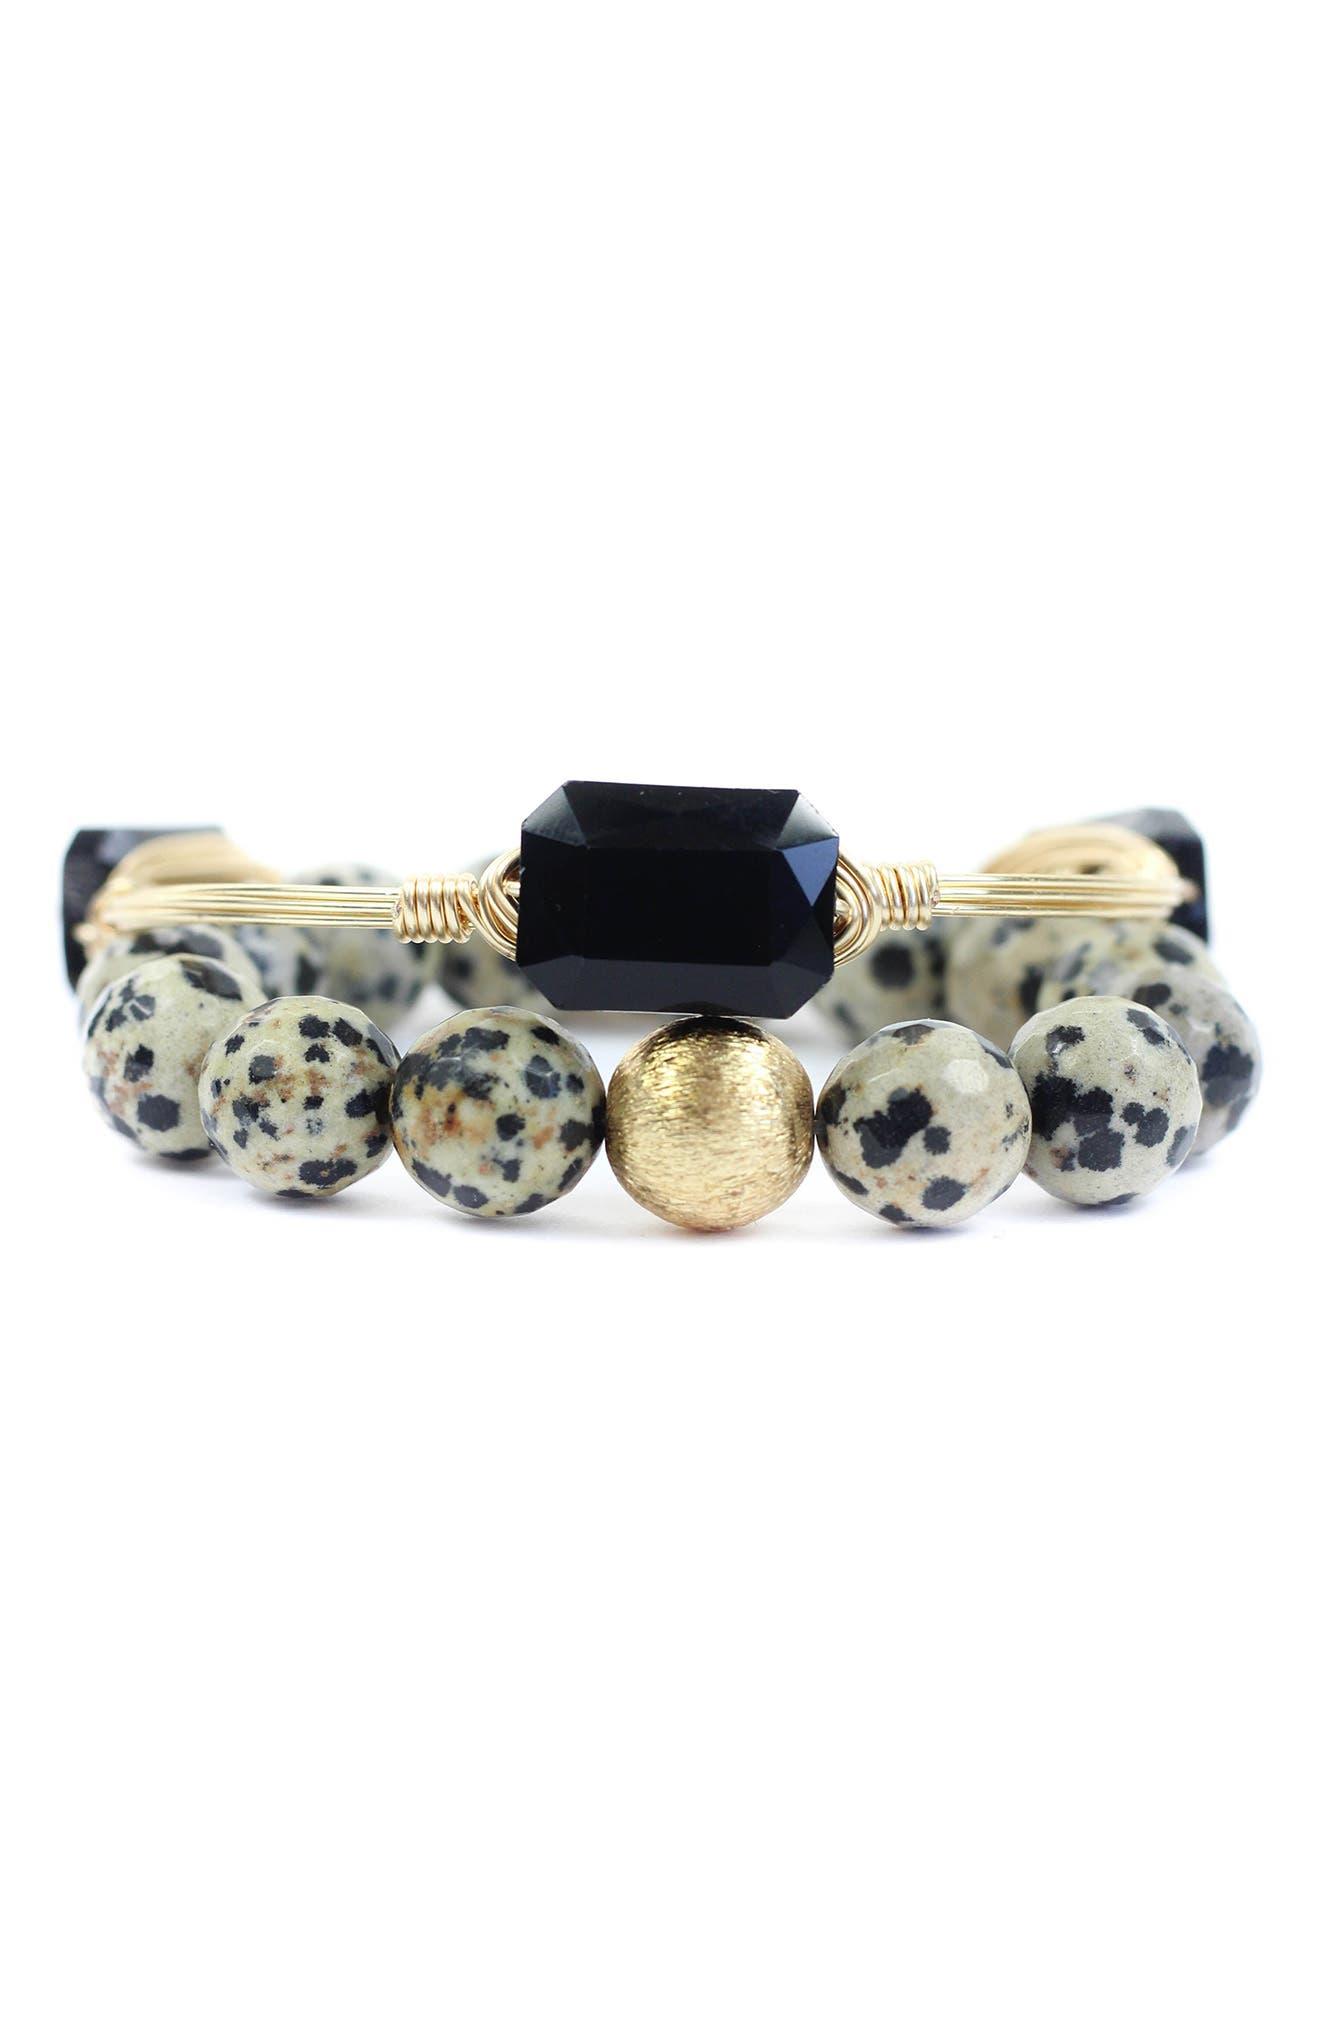 BOURBON AND BOWETIES Dalmatian Jasper & Black Crystal Bangle & Stretch Bracelet Set, Main, color, BLACK/ GOLD AND BLACK/ CREAM